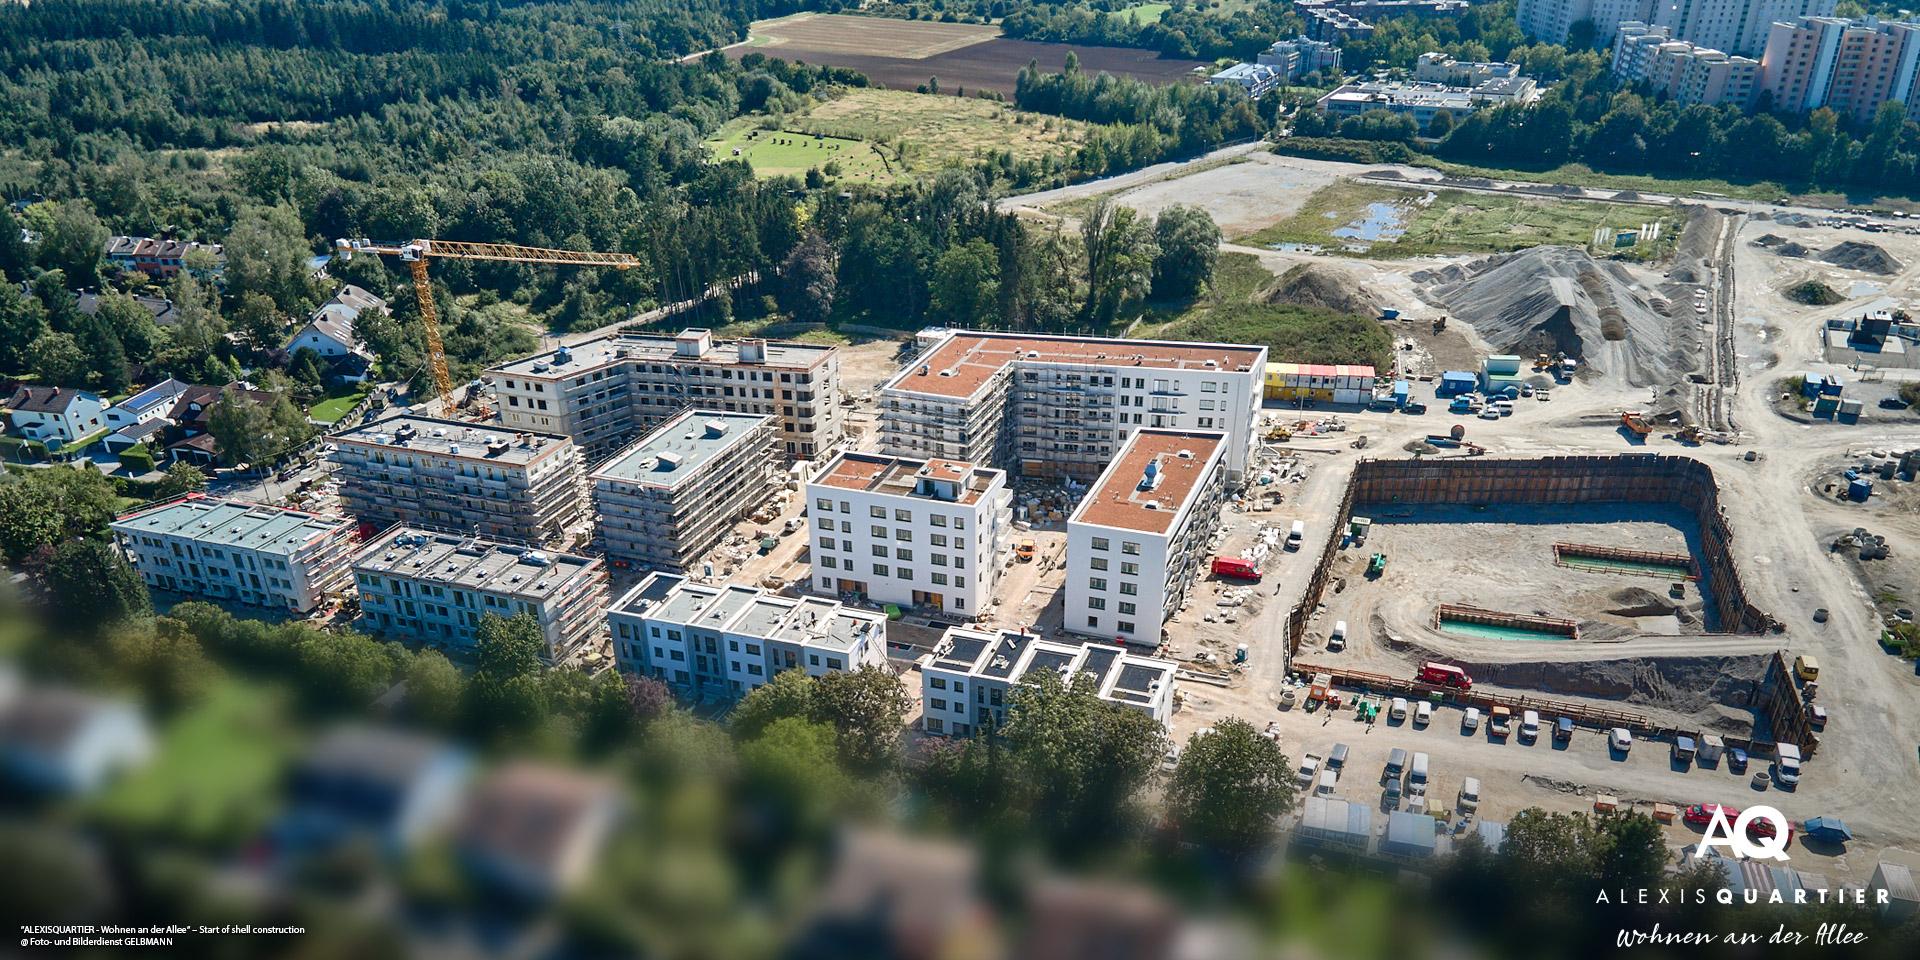 'ALEXISQUARTIER – Wohnen an der Allee' in Munich-Perlach: Start of the shell construction work